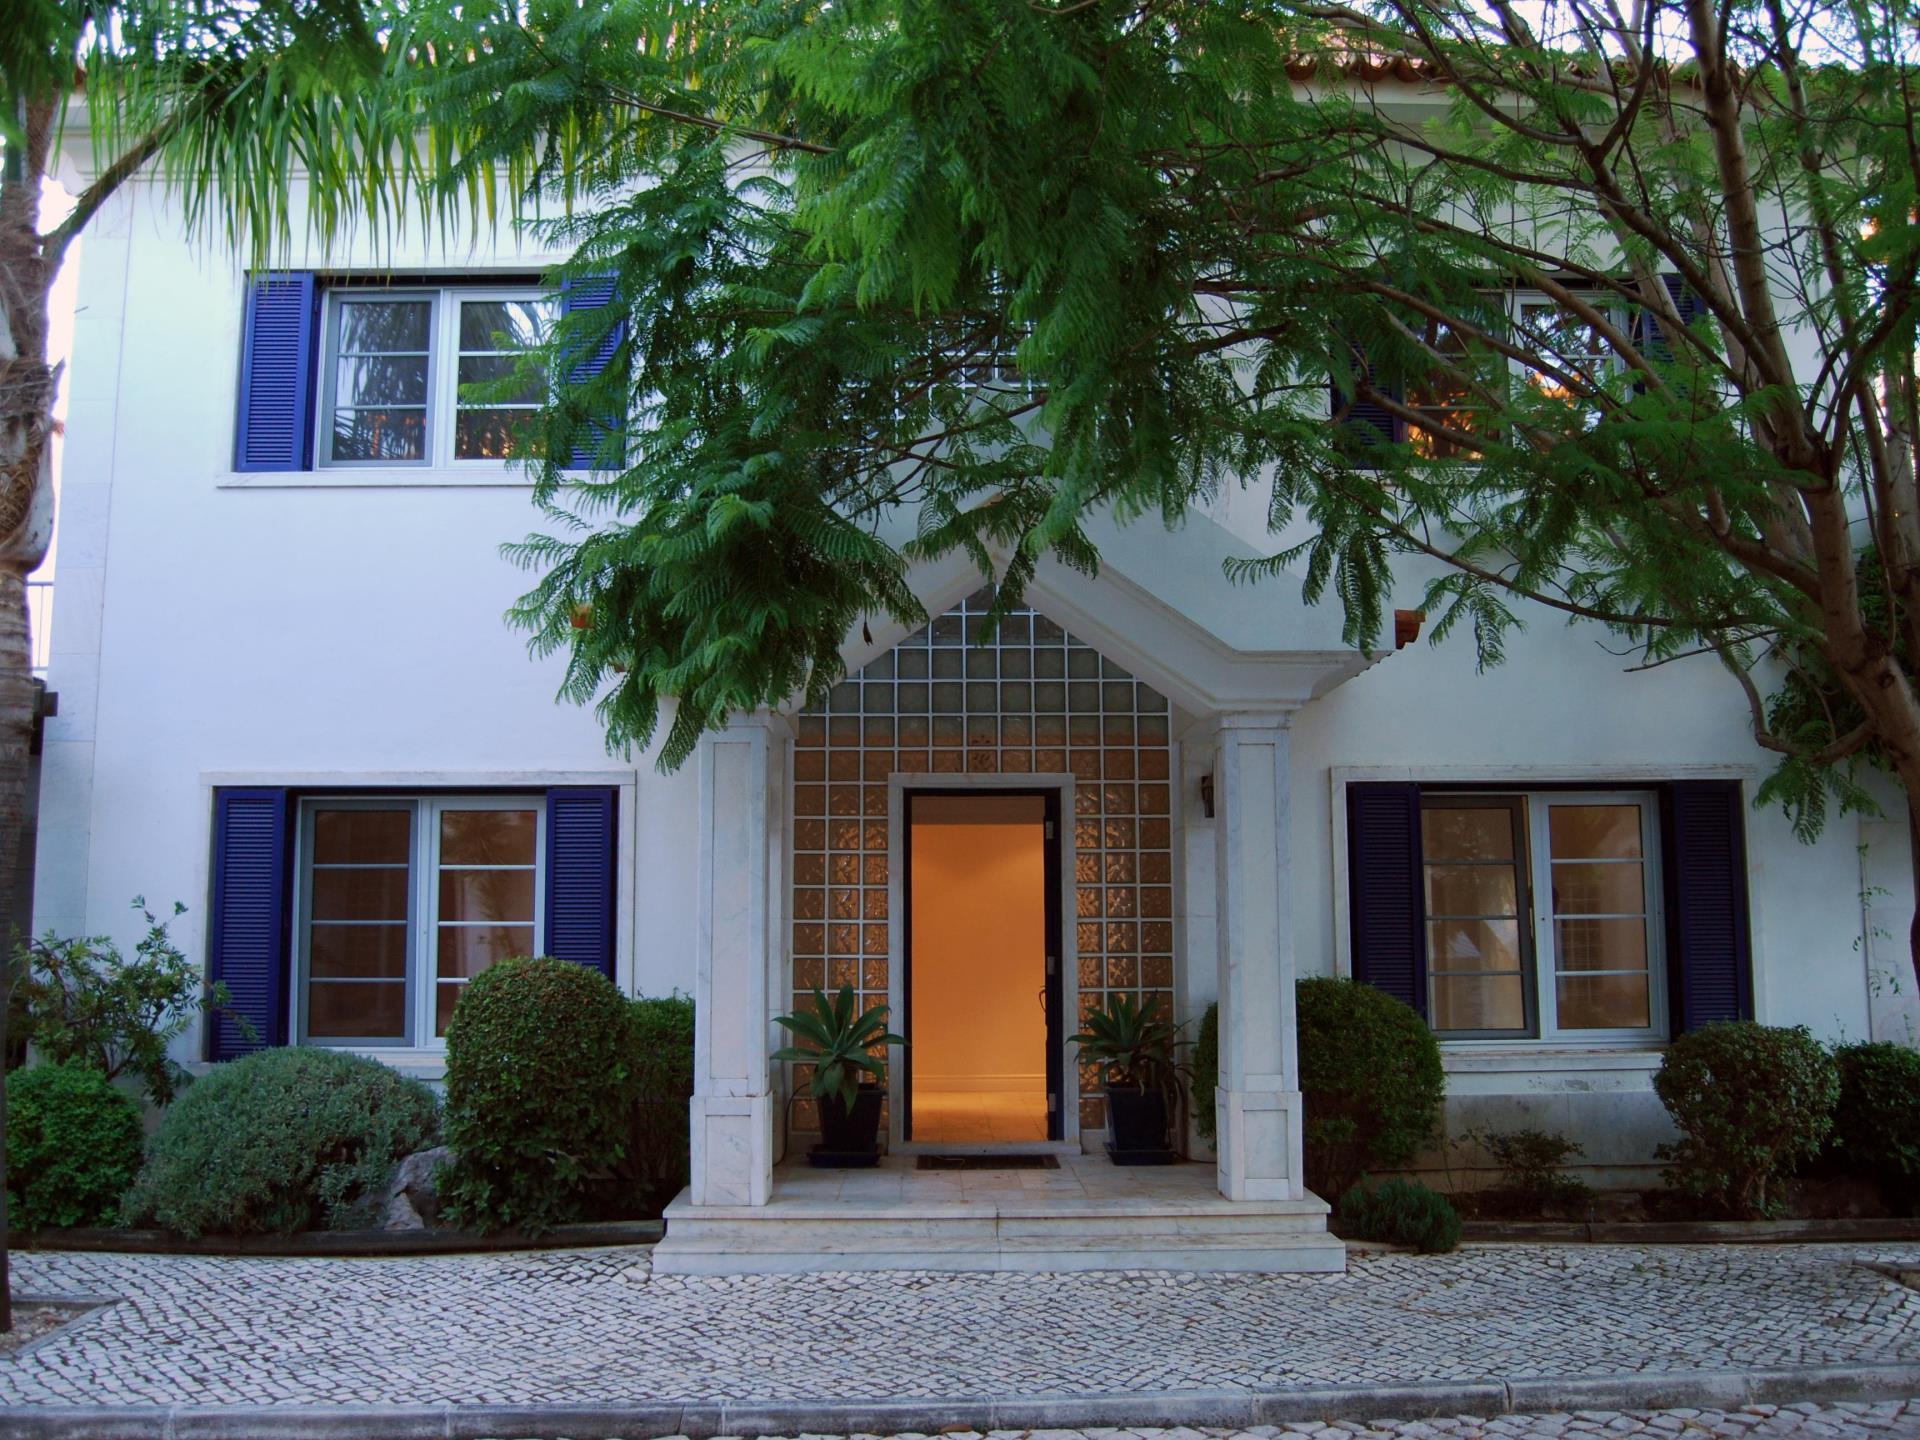 Tek Ailelik Ev için Satış at Semi-detached house, 4 bedrooms, for Sale Cascais, Lisboa Portekiz